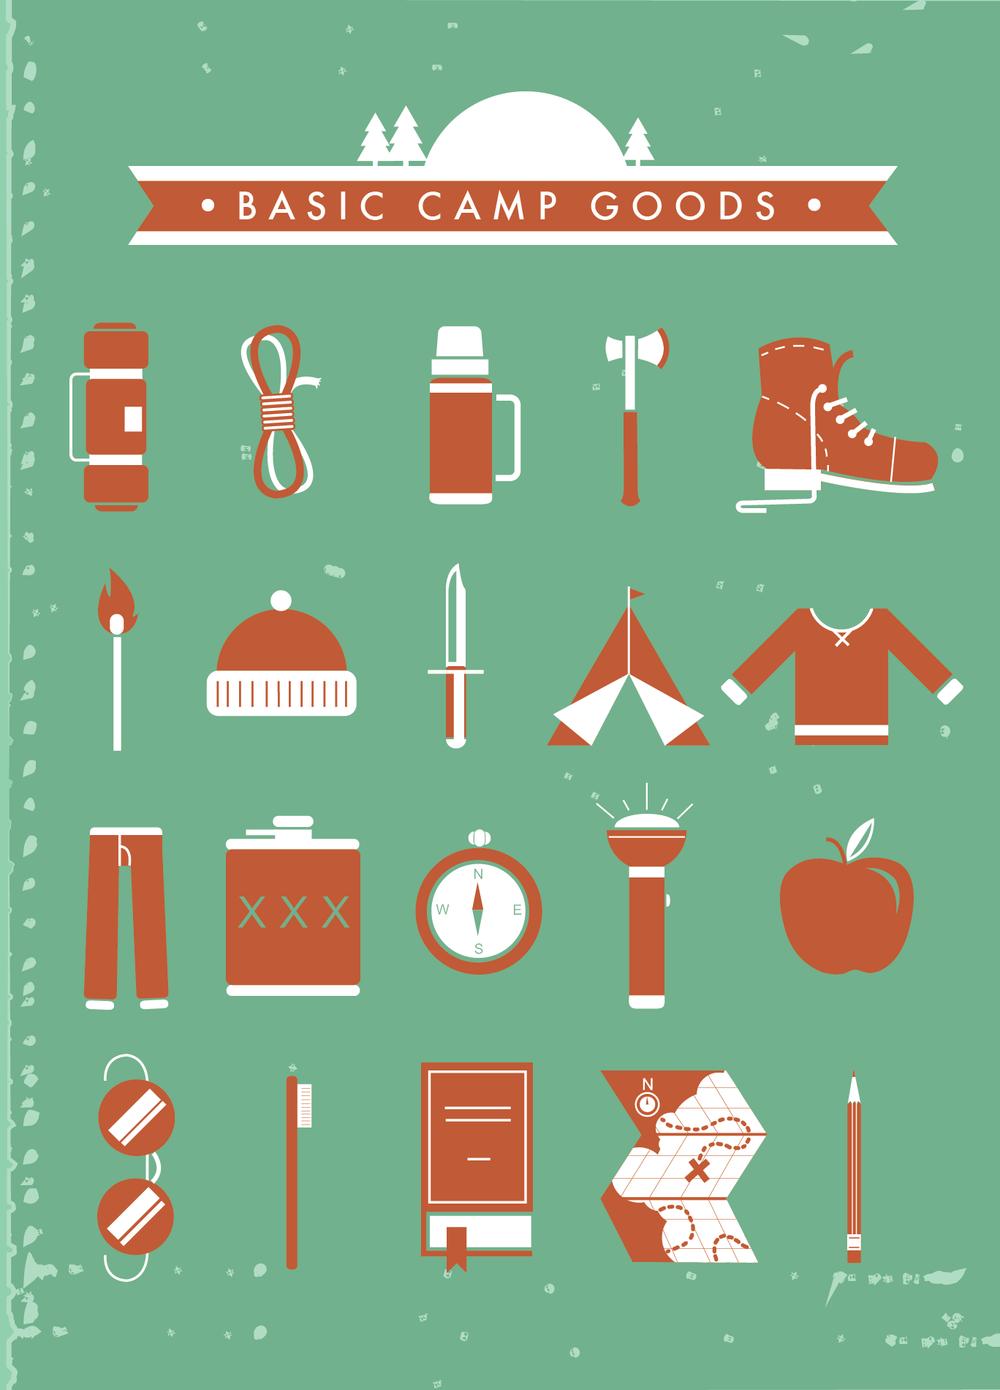 basic camp goods.png